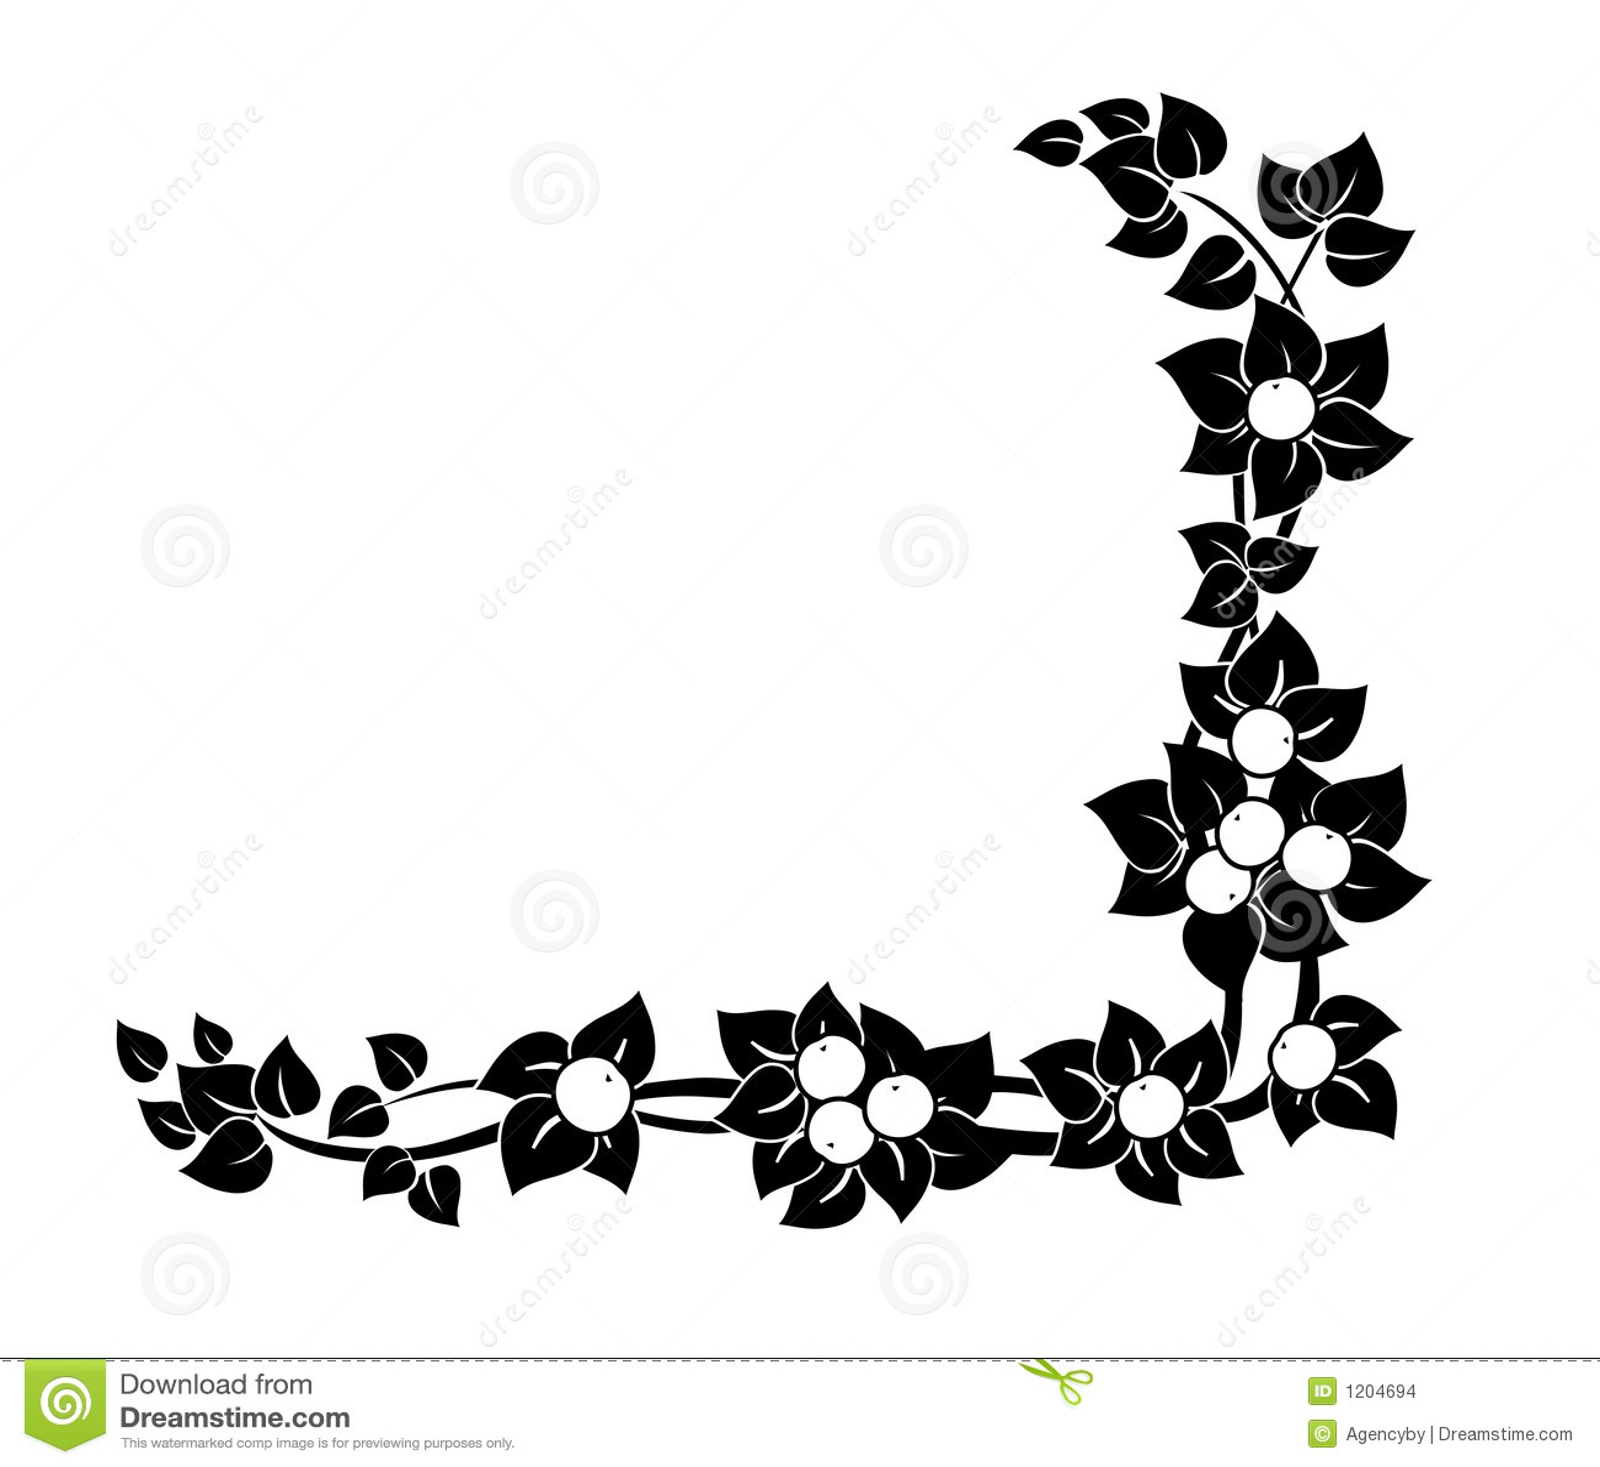 Black and white graphic decor - Decorative Corner Ornament Stock Images Image 1204694